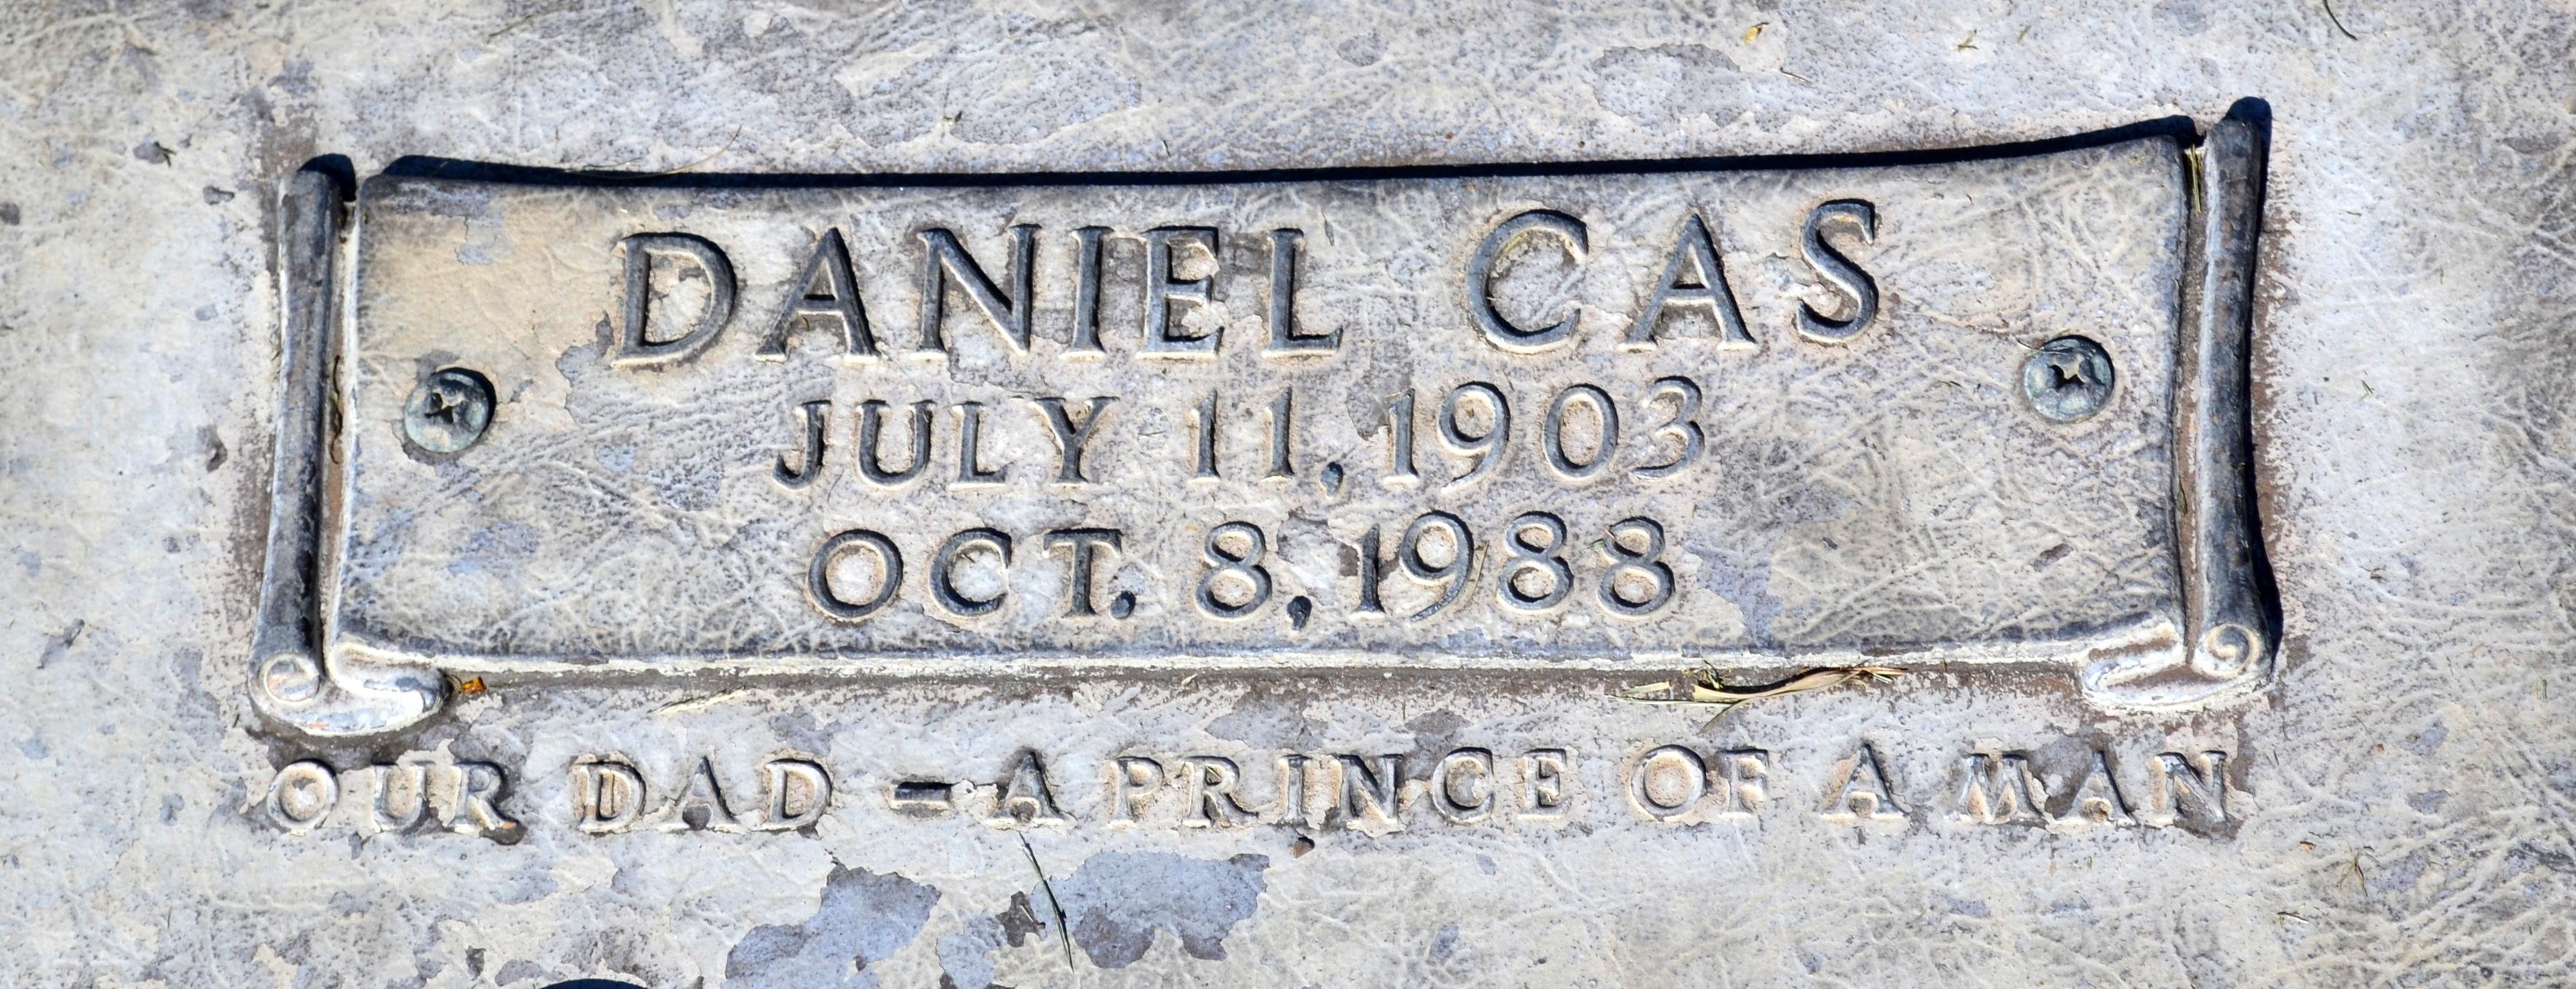 Daniel Cas Adams